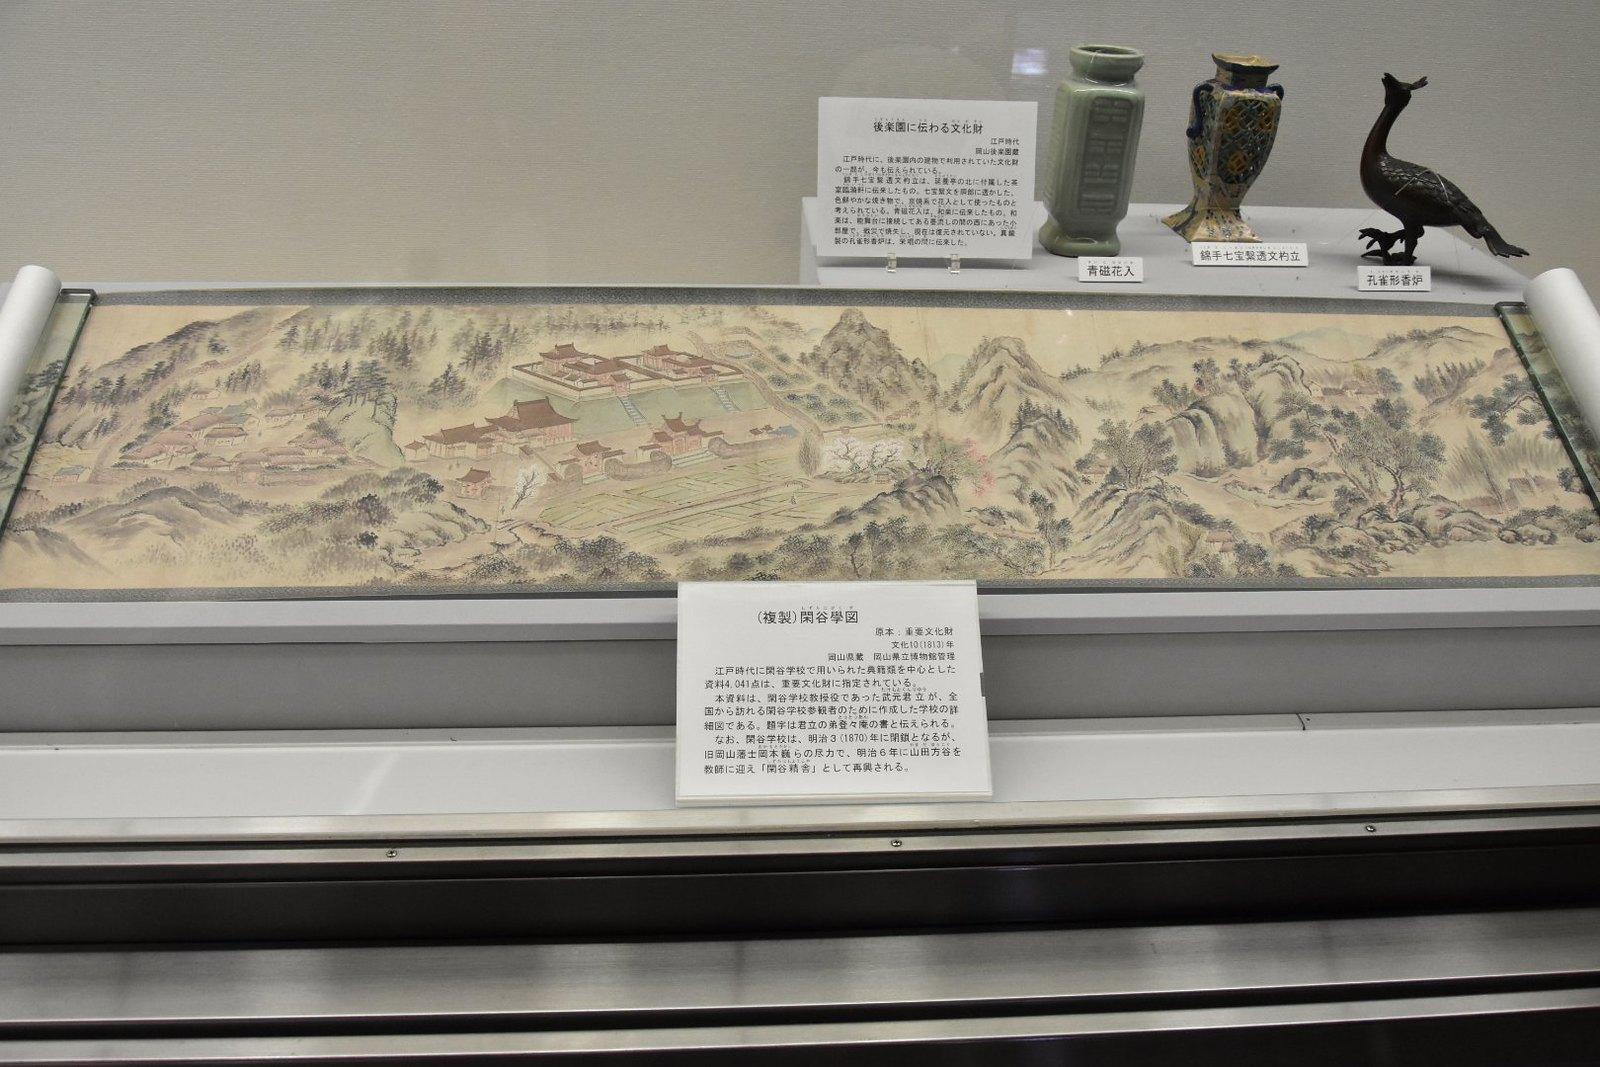 Musée préfectoral d'Okayama